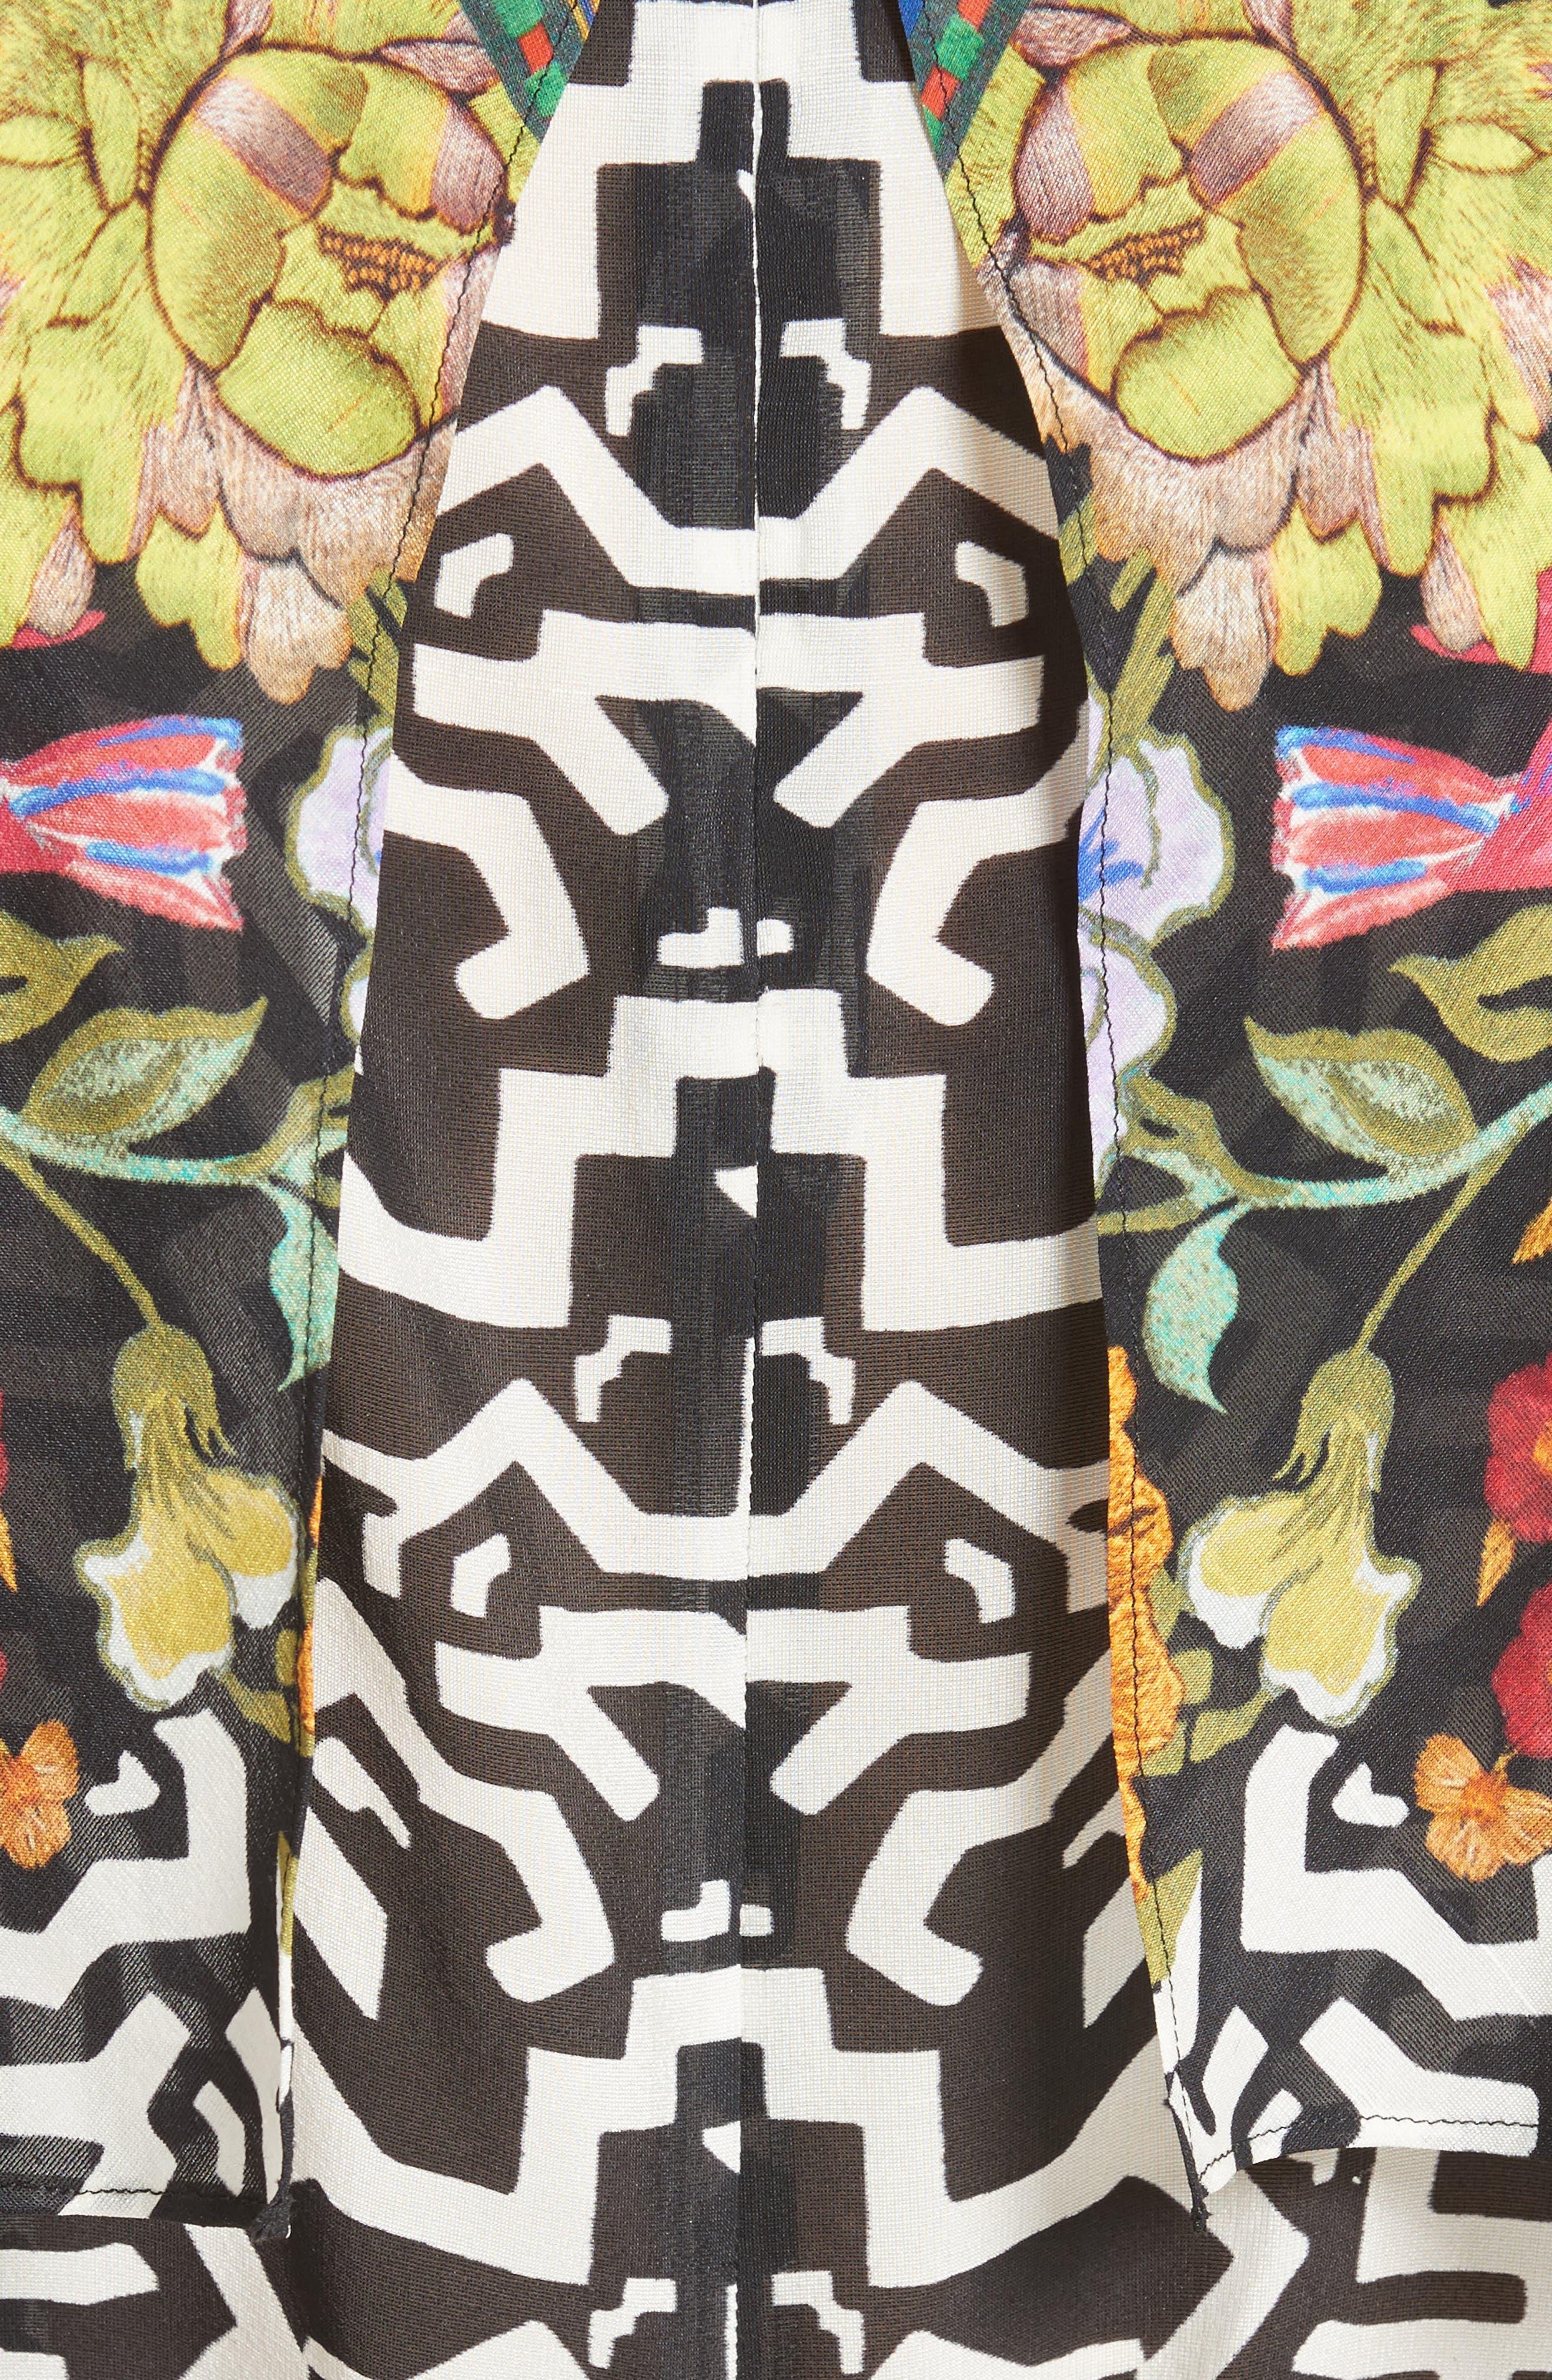 Floral & Maze Print Silk Blouse,                             Alternate thumbnail 5, color,                             650